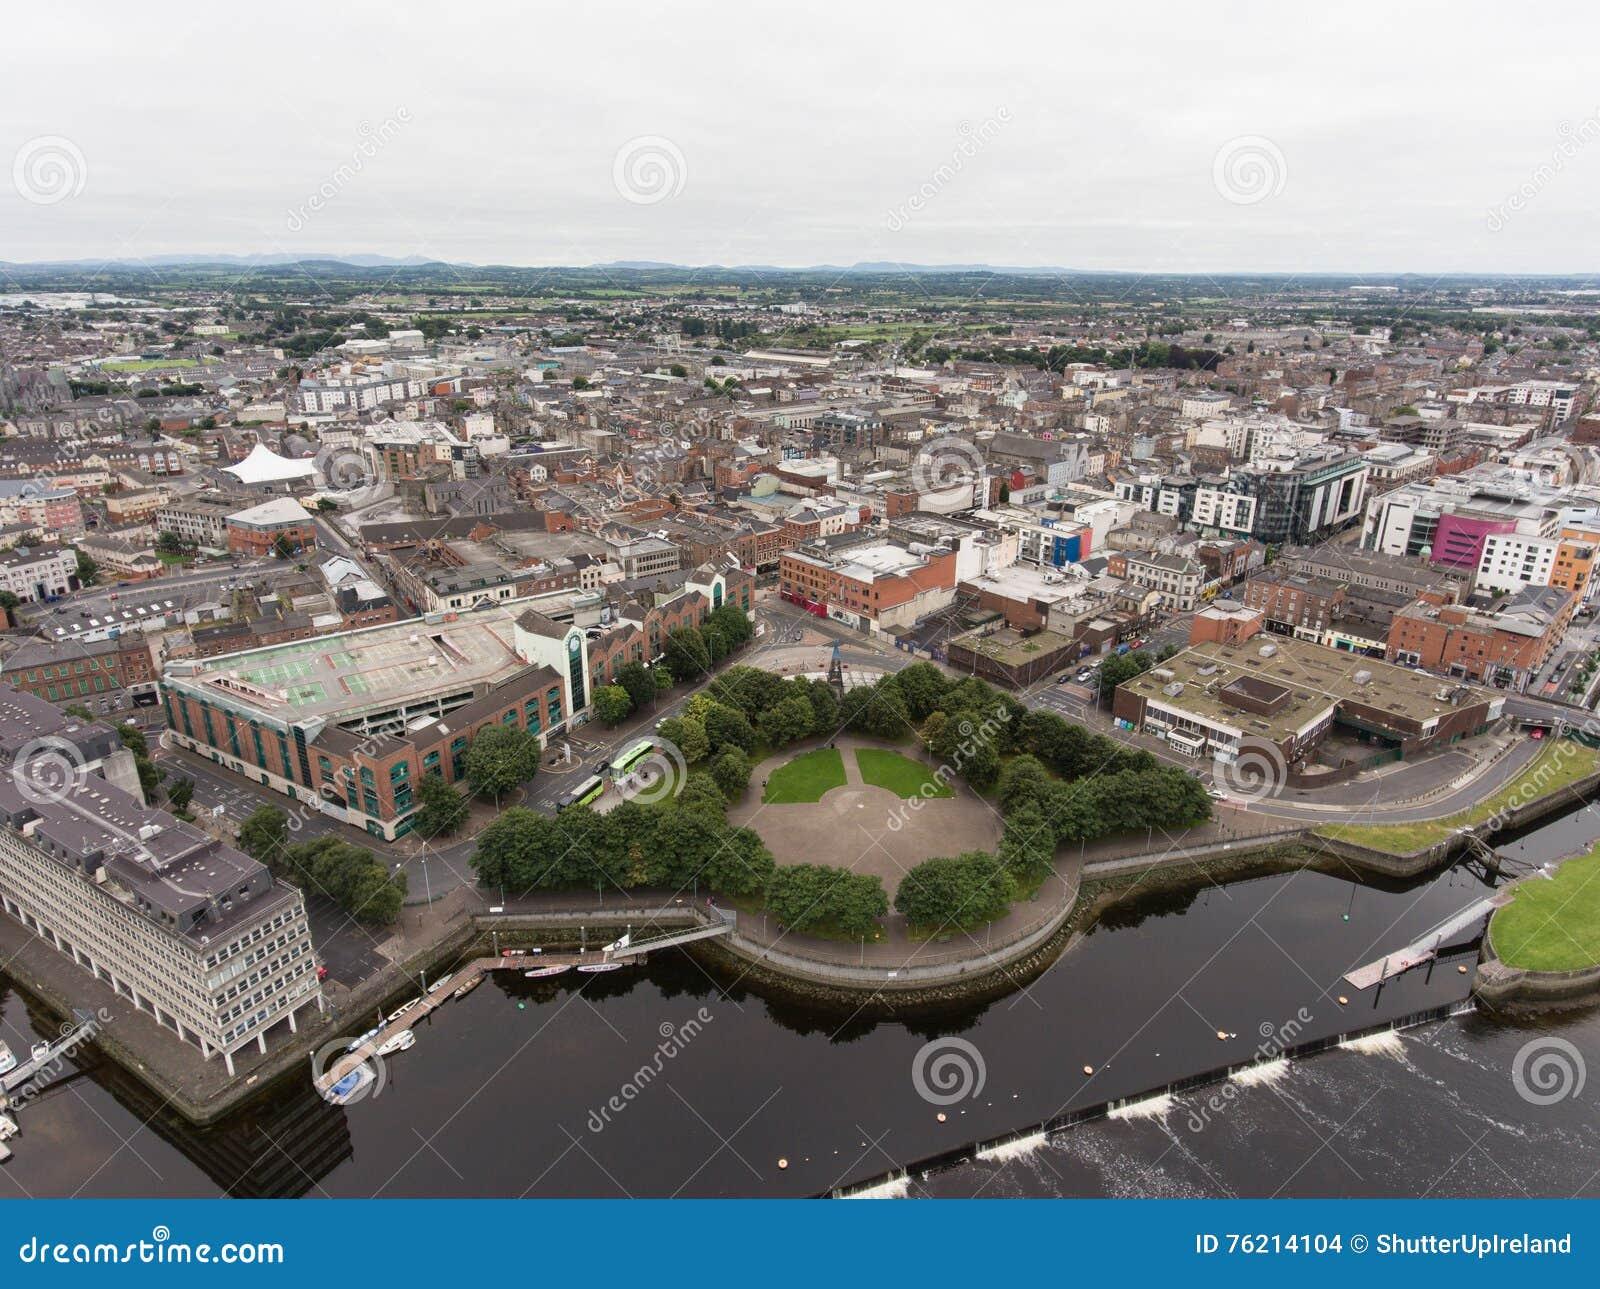 Aerial View Cityscape Of Limerick City Skyline, Ireland